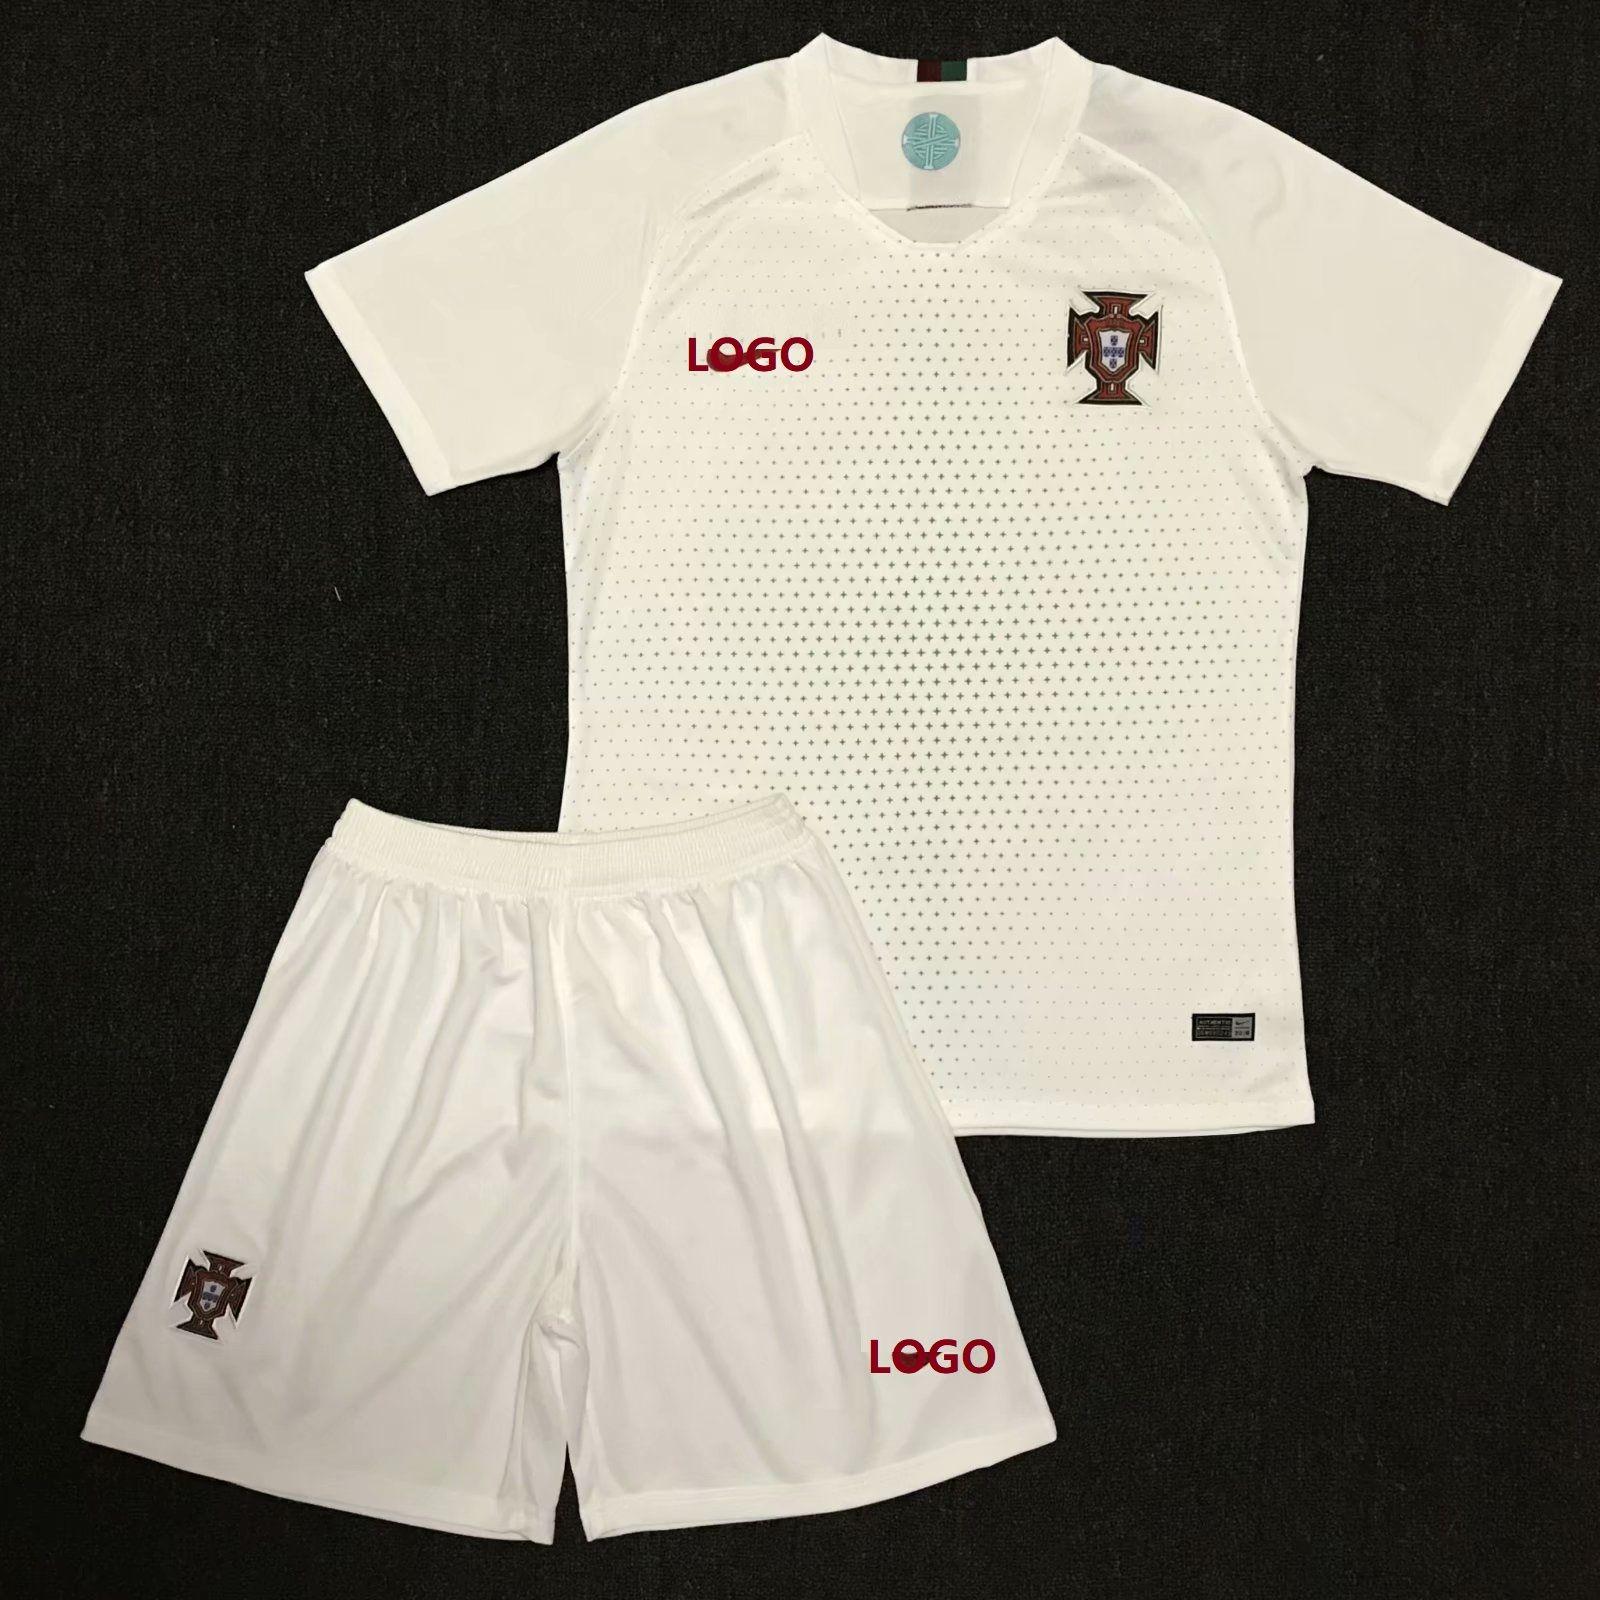 fb93fb758 2018 Russia World Cup Adult Portugal Away White Soccer Kits Man Soccer  Uniform Football Jersey Customization Name Number Football Jersey uniforme  de fútbol